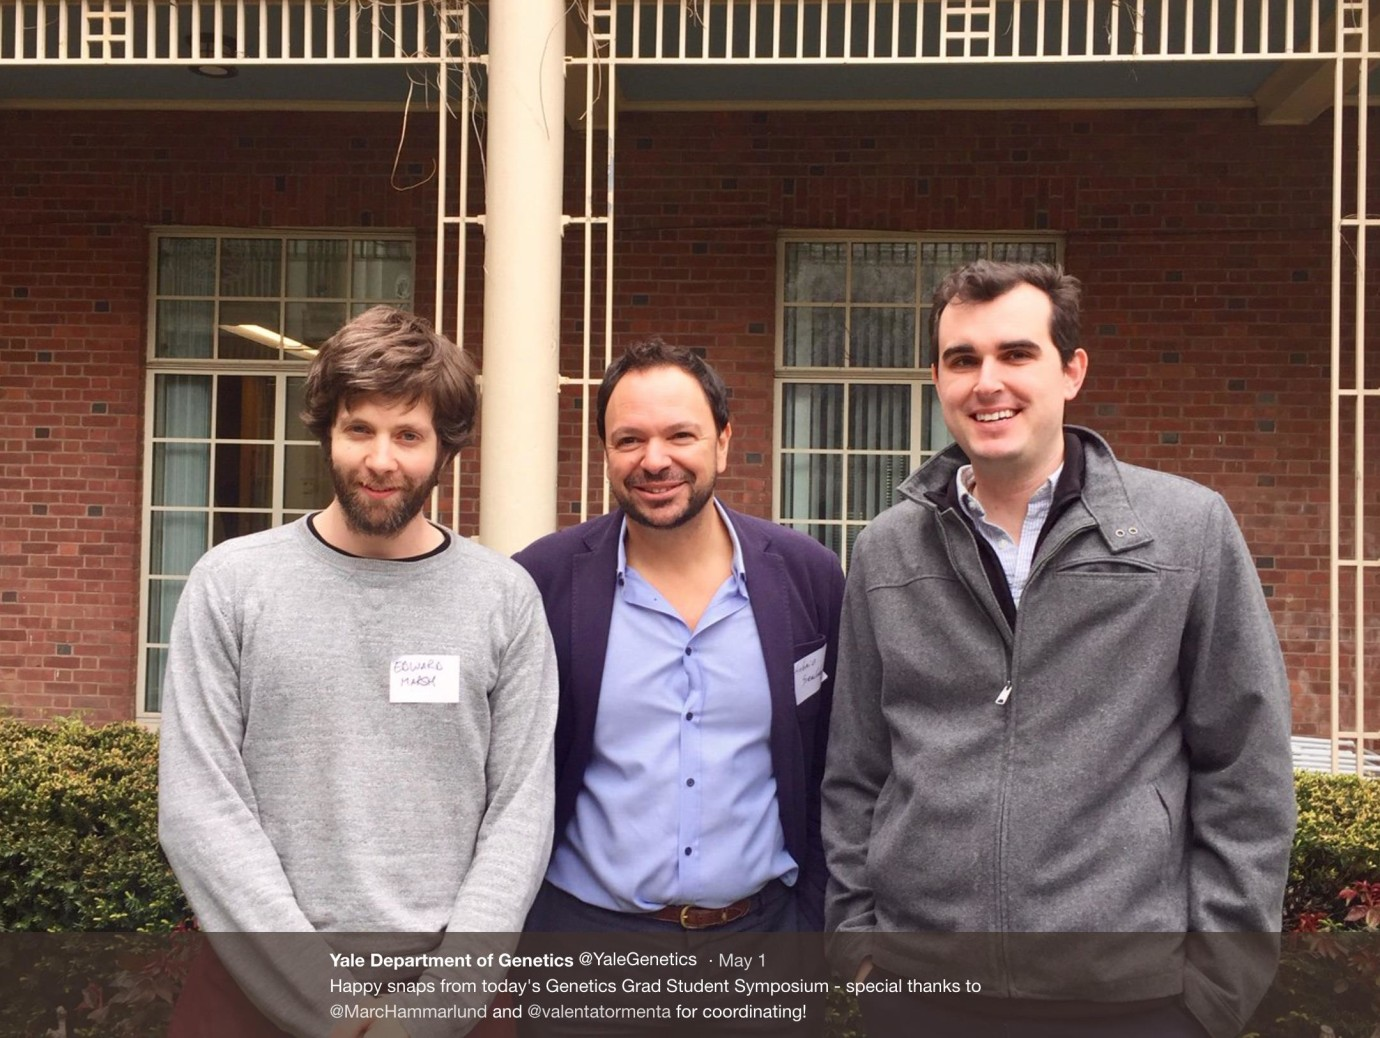 Yale Genetics Grad Student Symposium